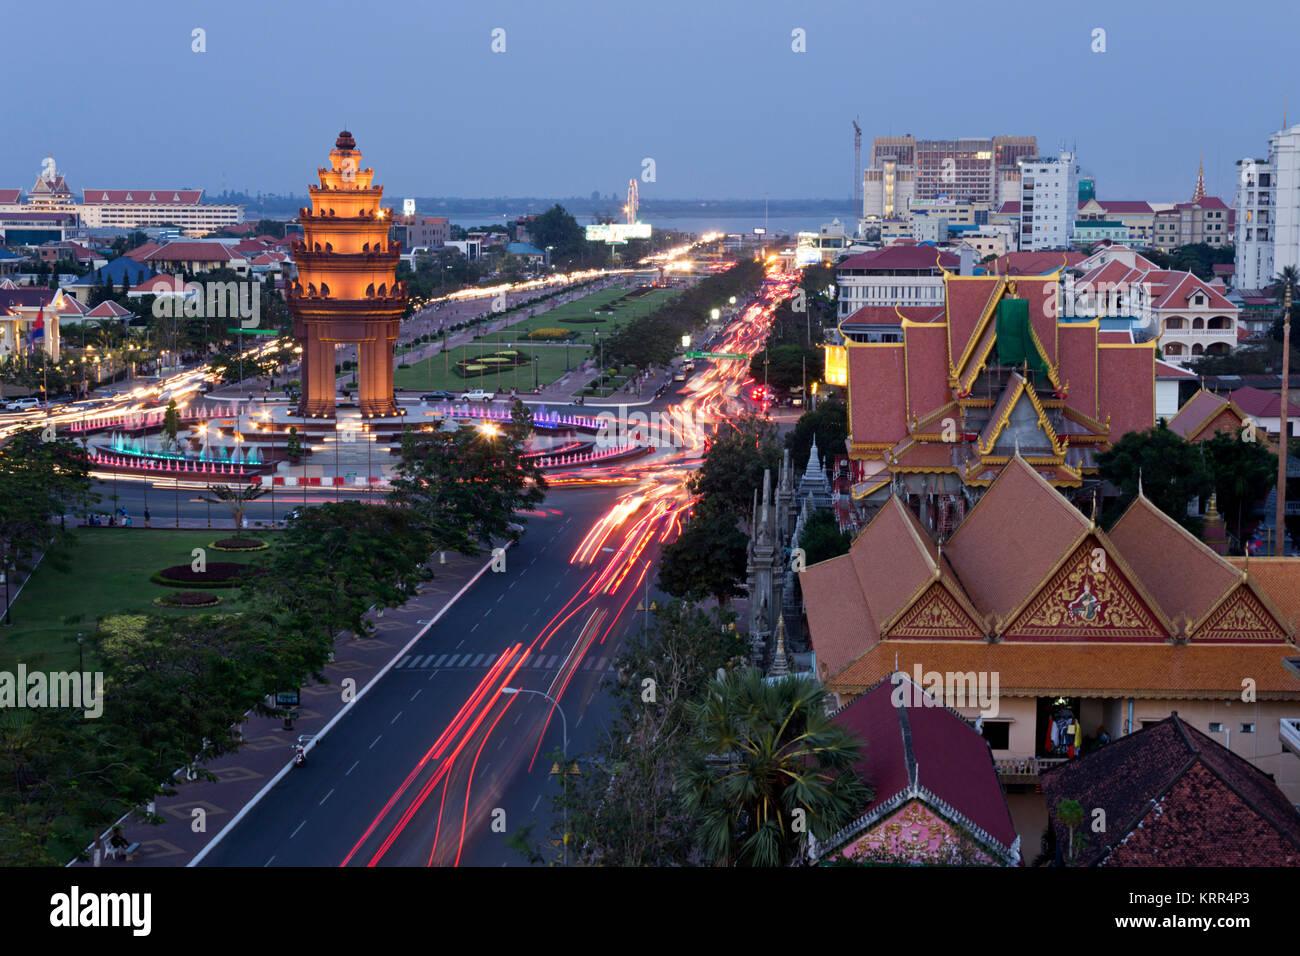 Die Unabhängigkeit Mounument, Phnom Penh, Kambodscha Stockbild